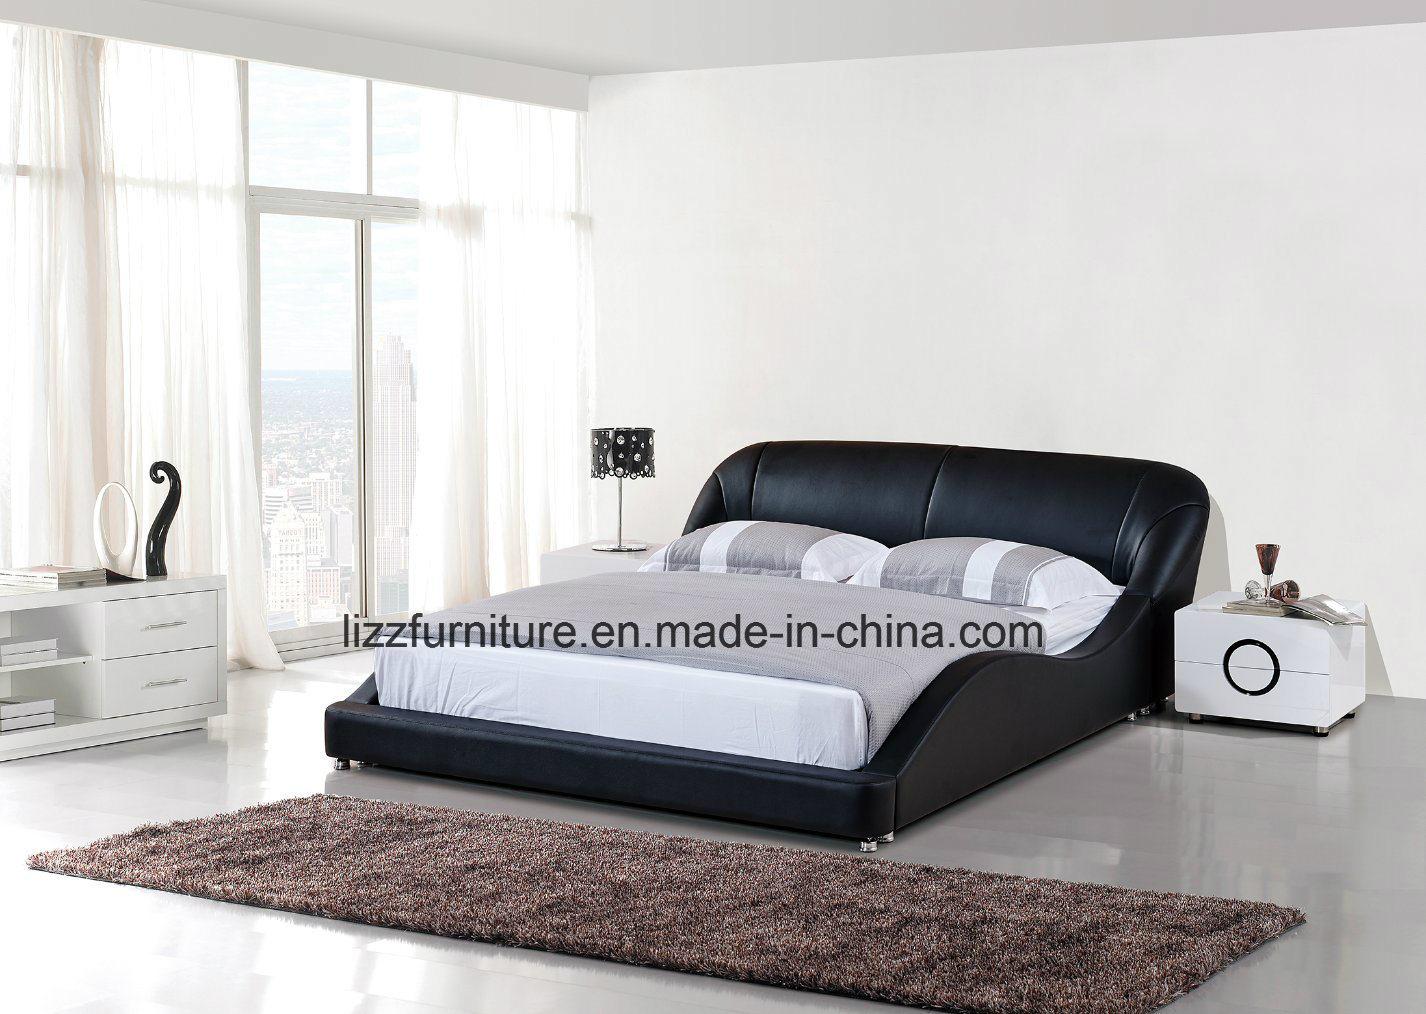 China Divan Bedroom Set Modern Italian Leather King Size Bed Frame China Soft Bed Bed Set